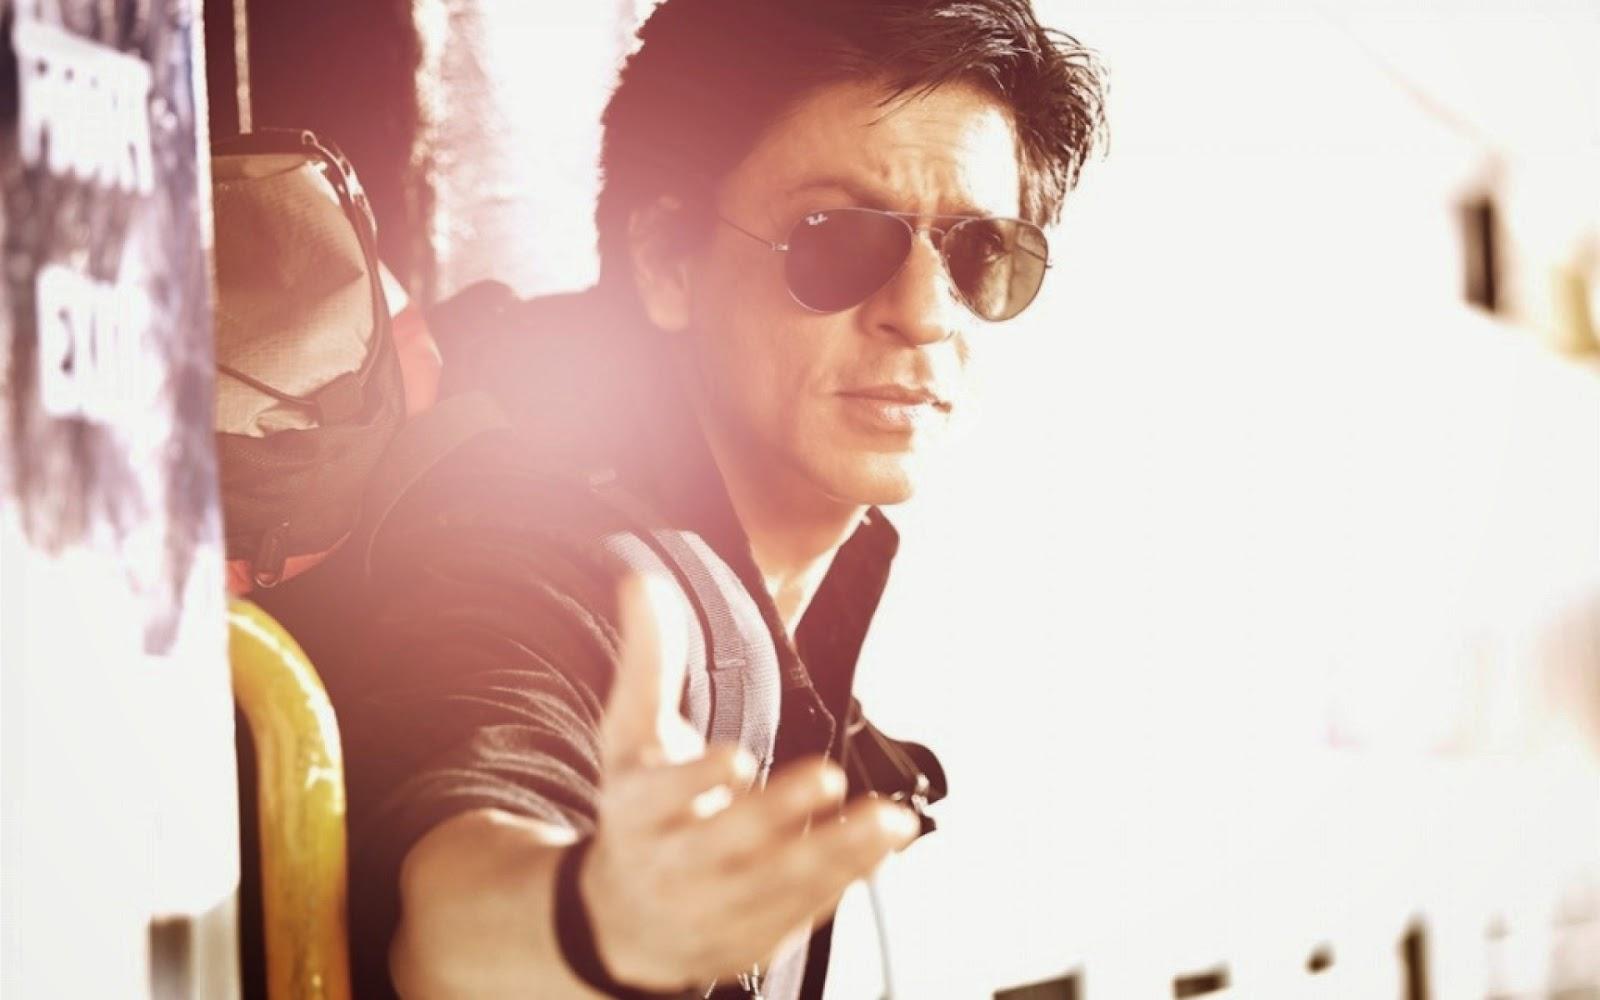 Shahrukh Khan New HD Wallpaper 2014